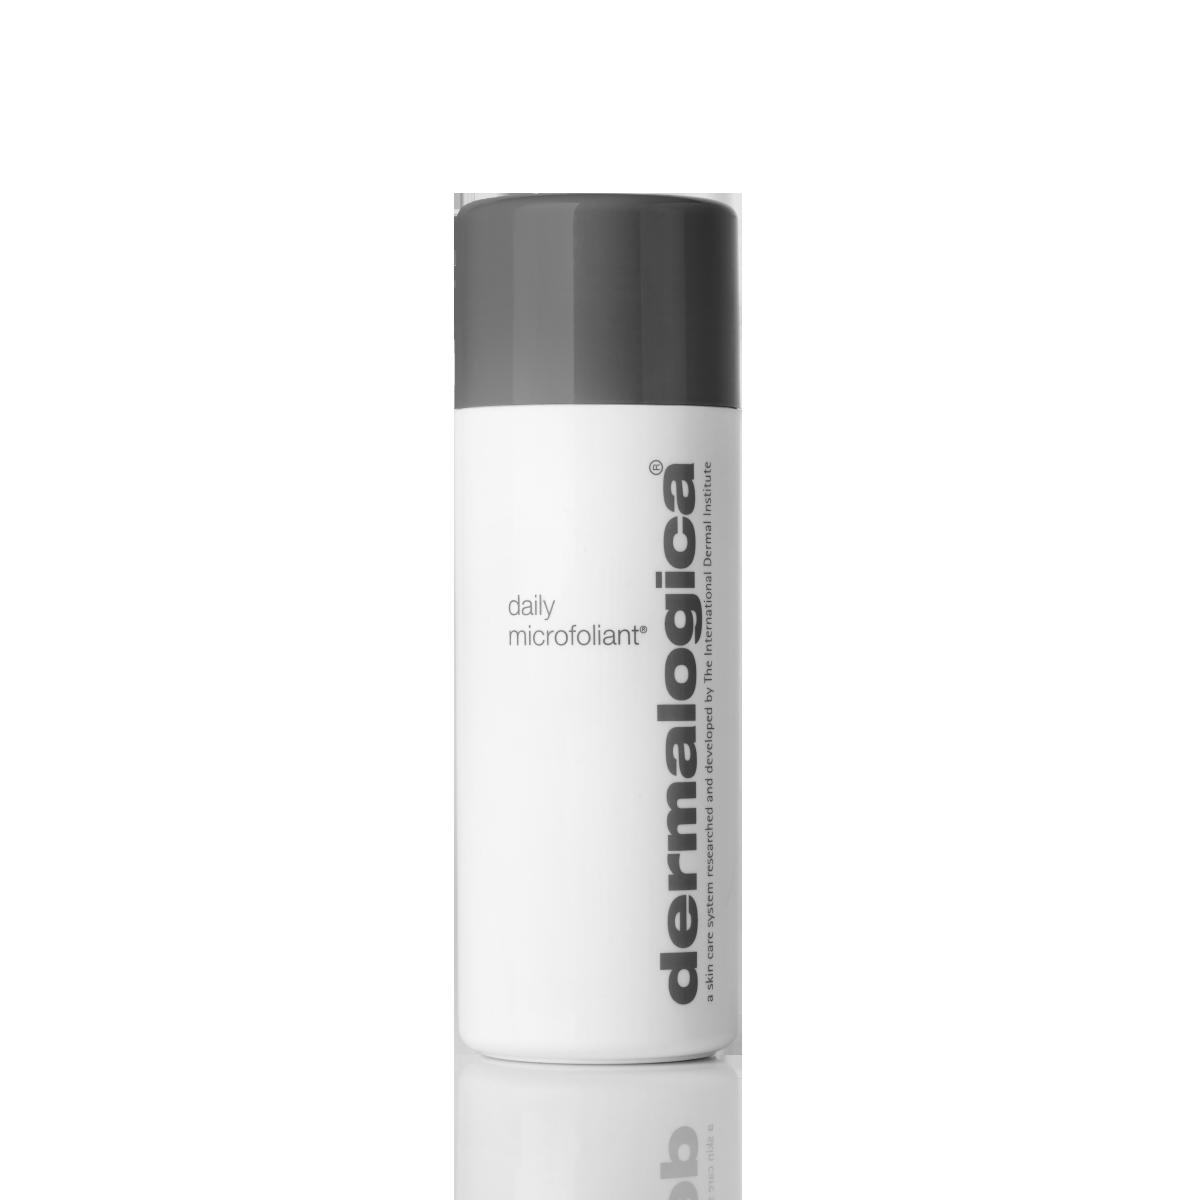 Daily Microfoliant - 75gr-1